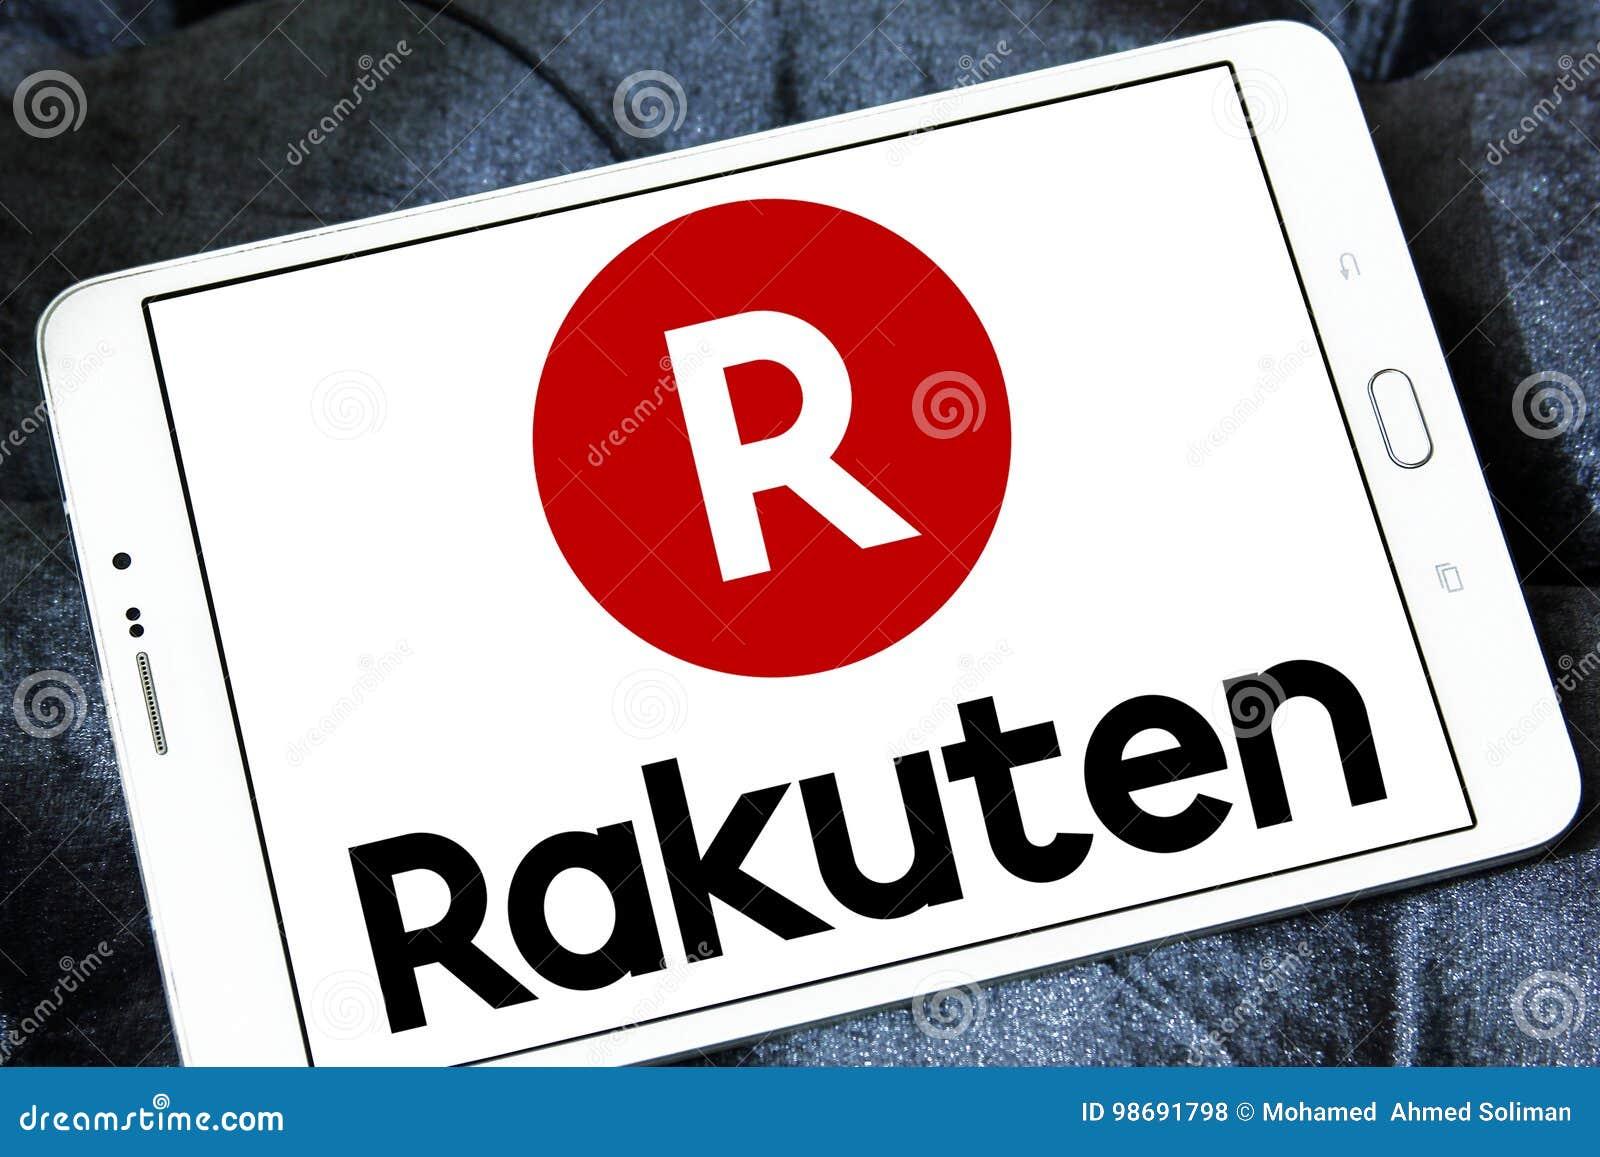 tokyo multinational electronics company logos choice image